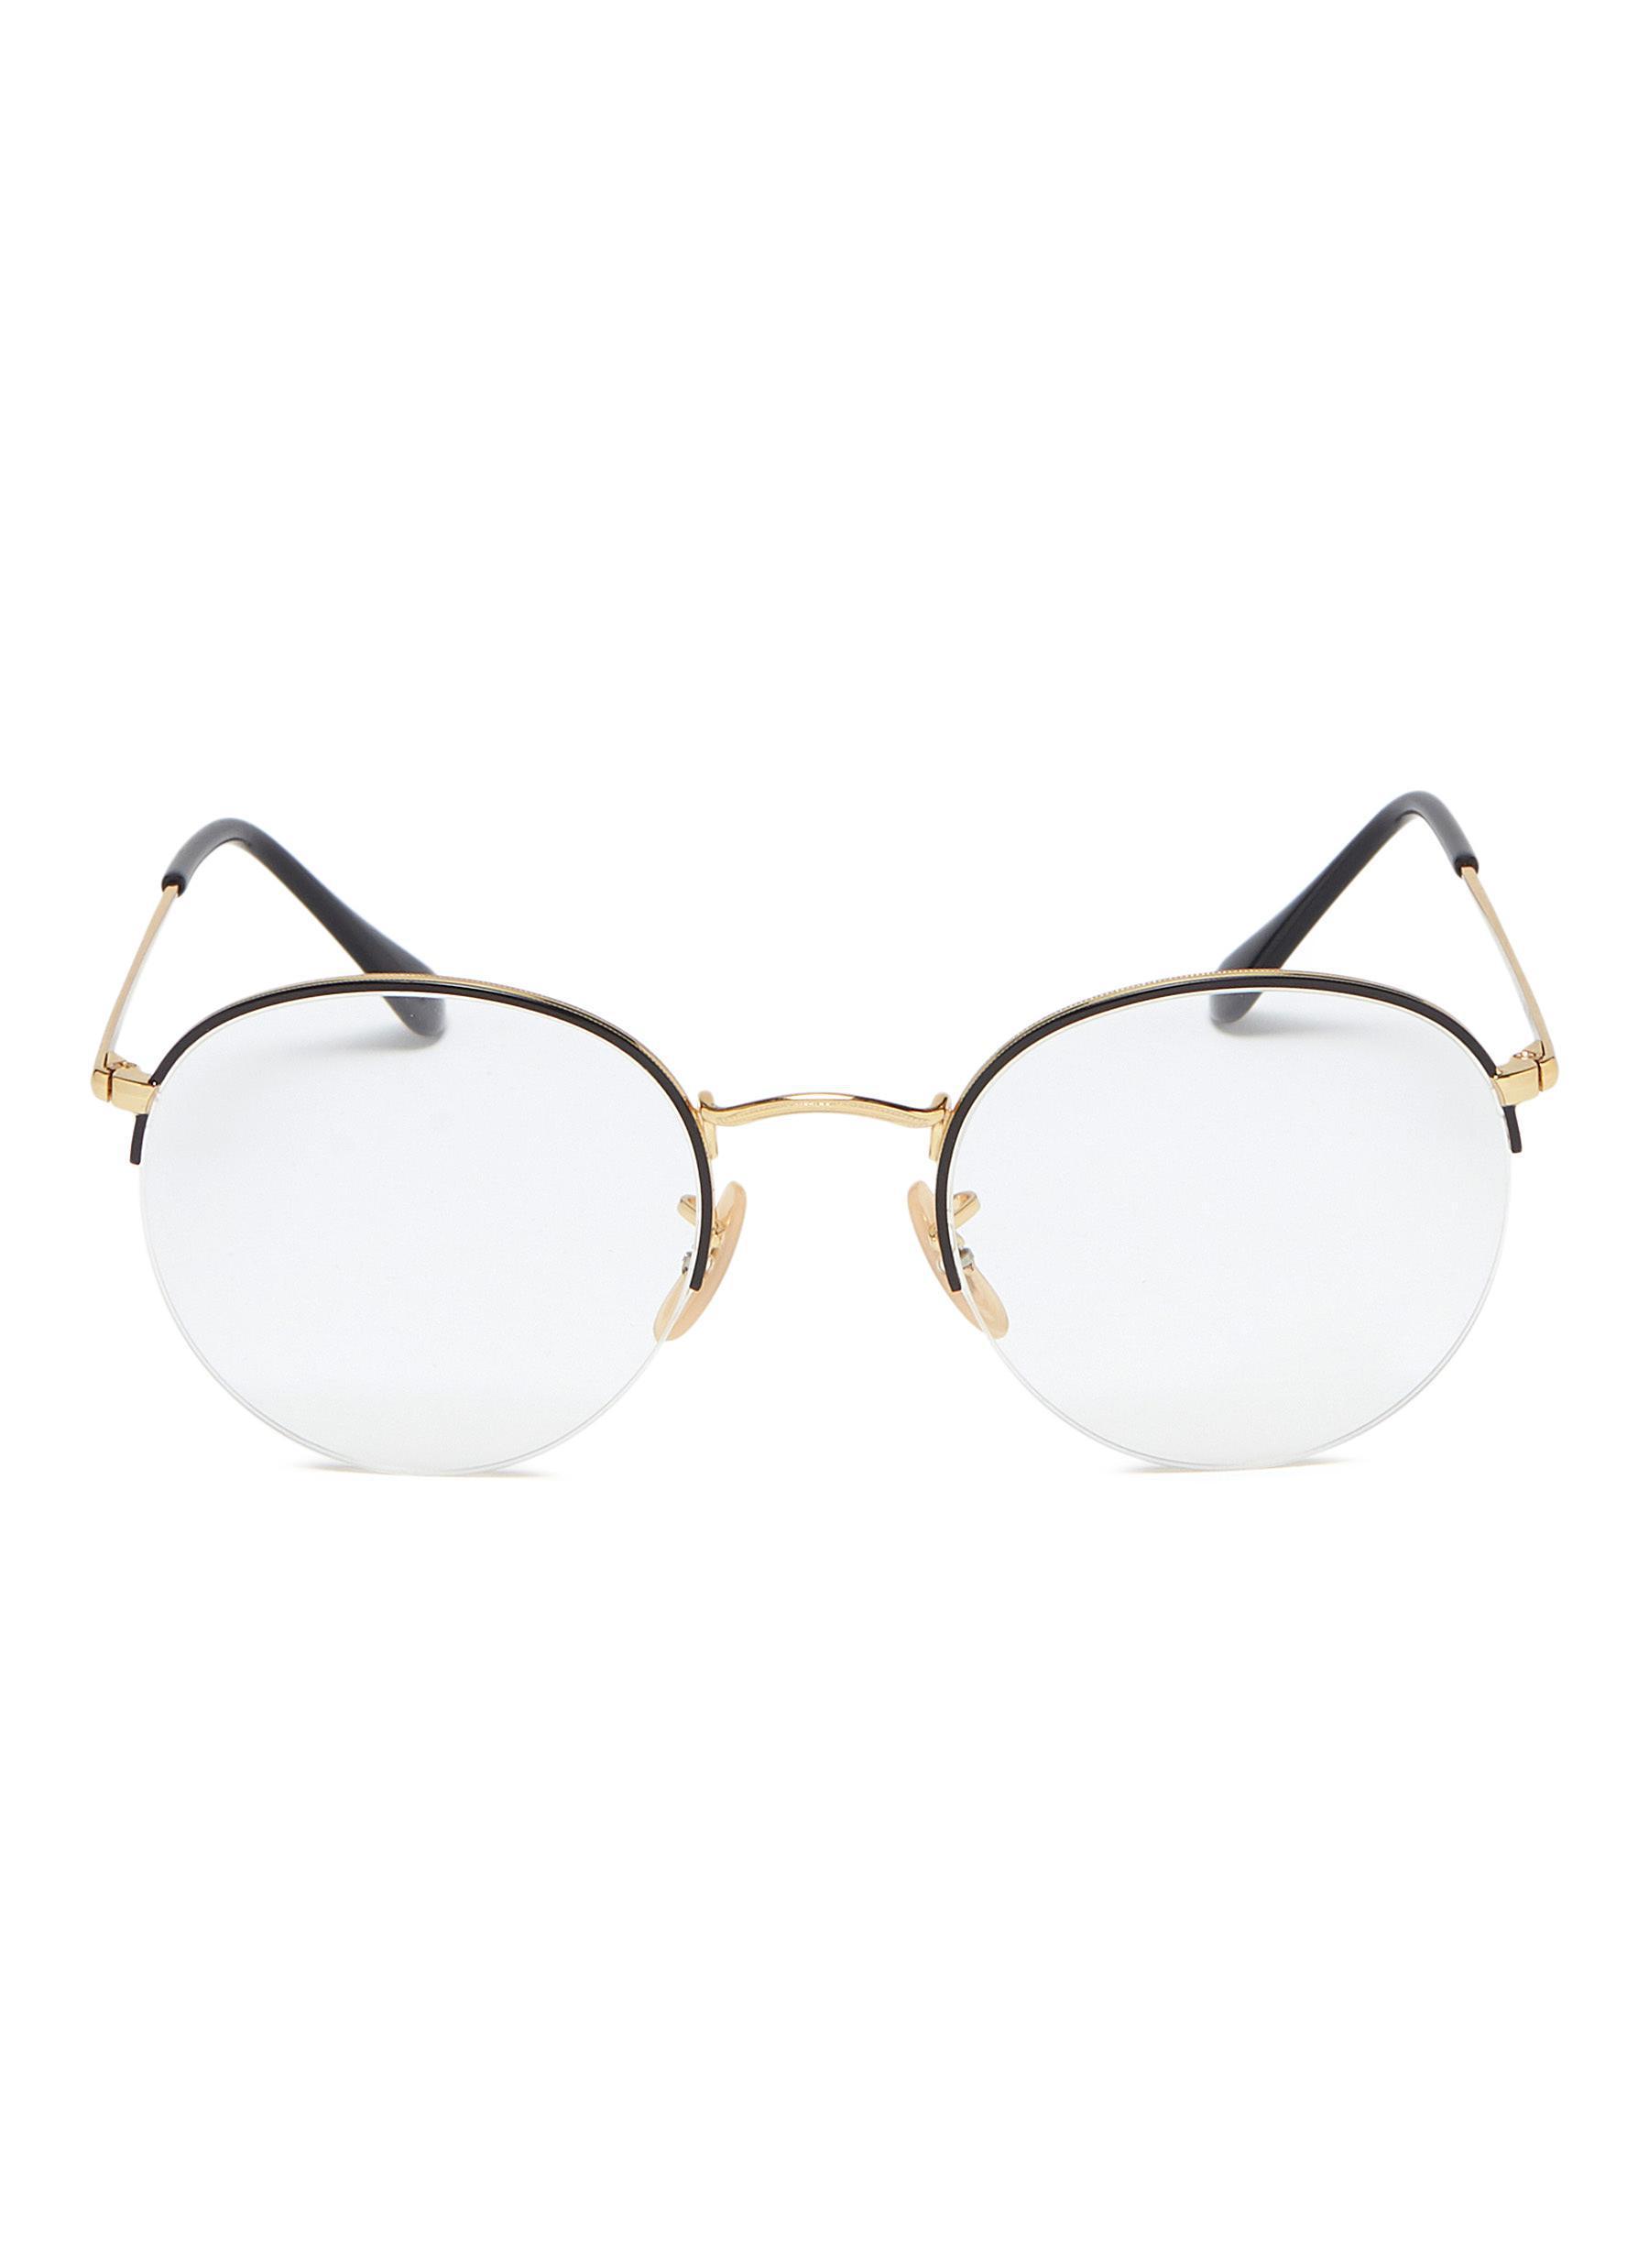 9cdfe4a9c Ray-Ban 'gaze' Metal Round Optical Glasses in Metallic - Lyst